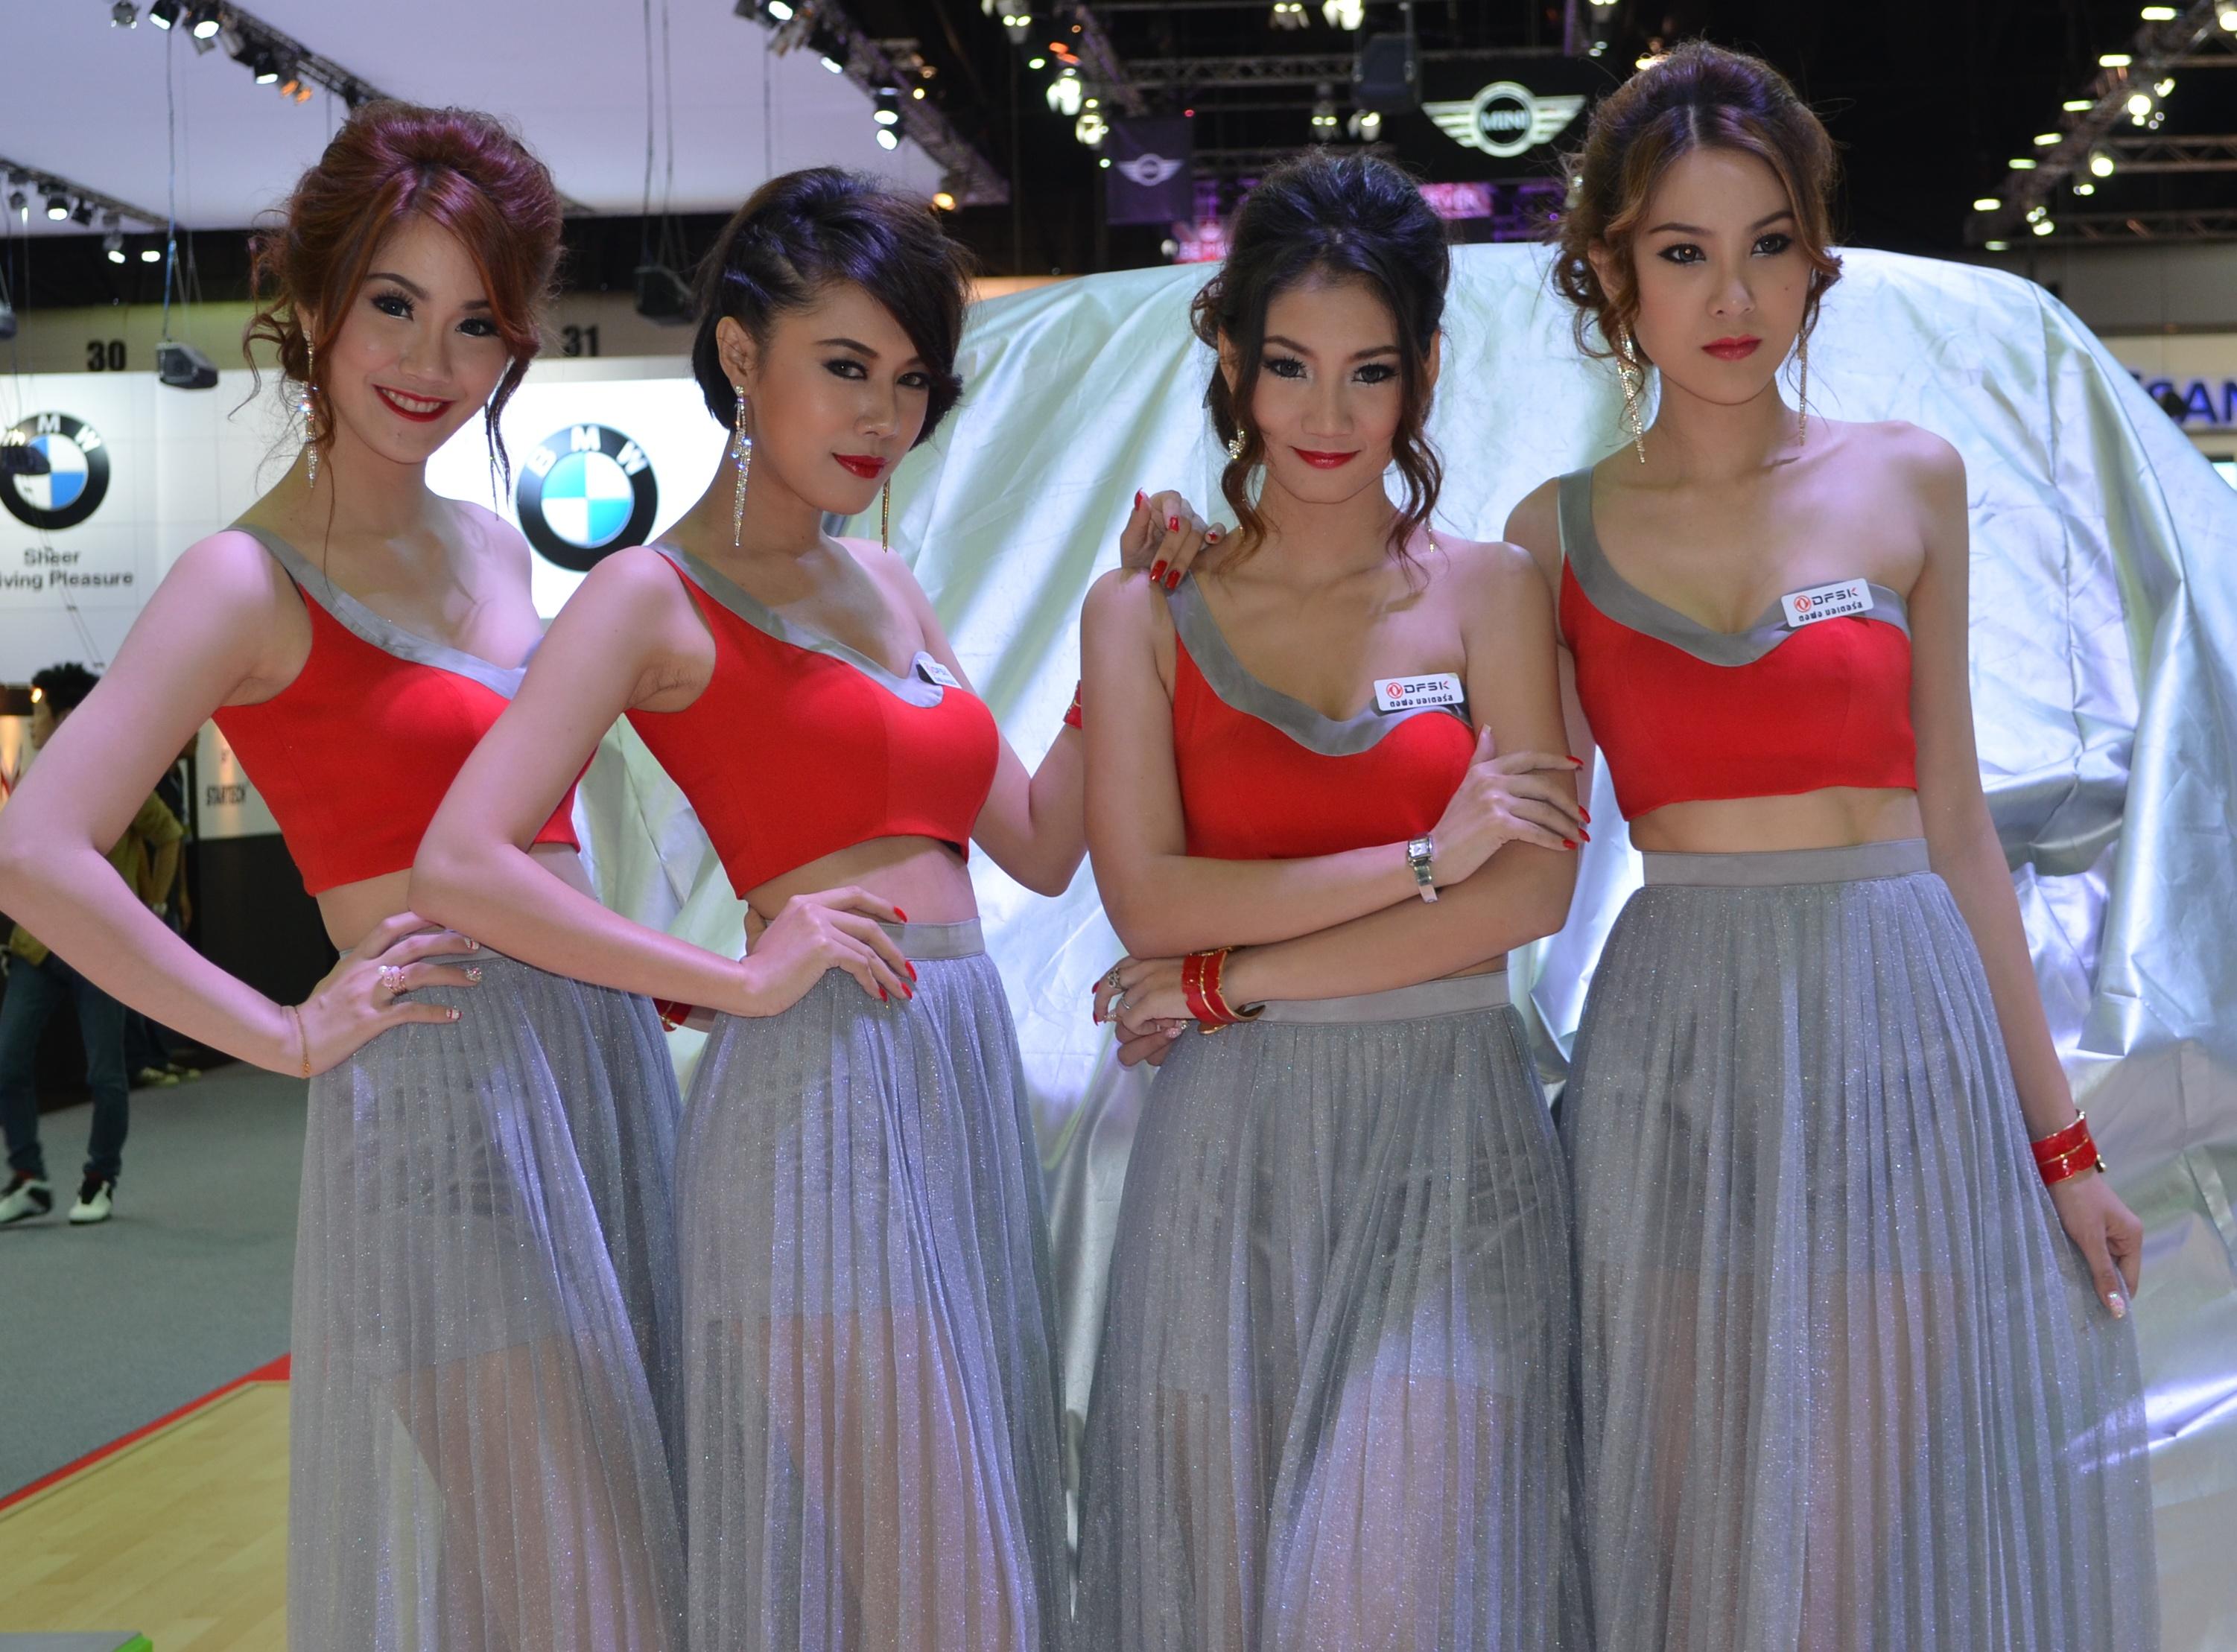 Фото женщин в тайланде 3 фотография